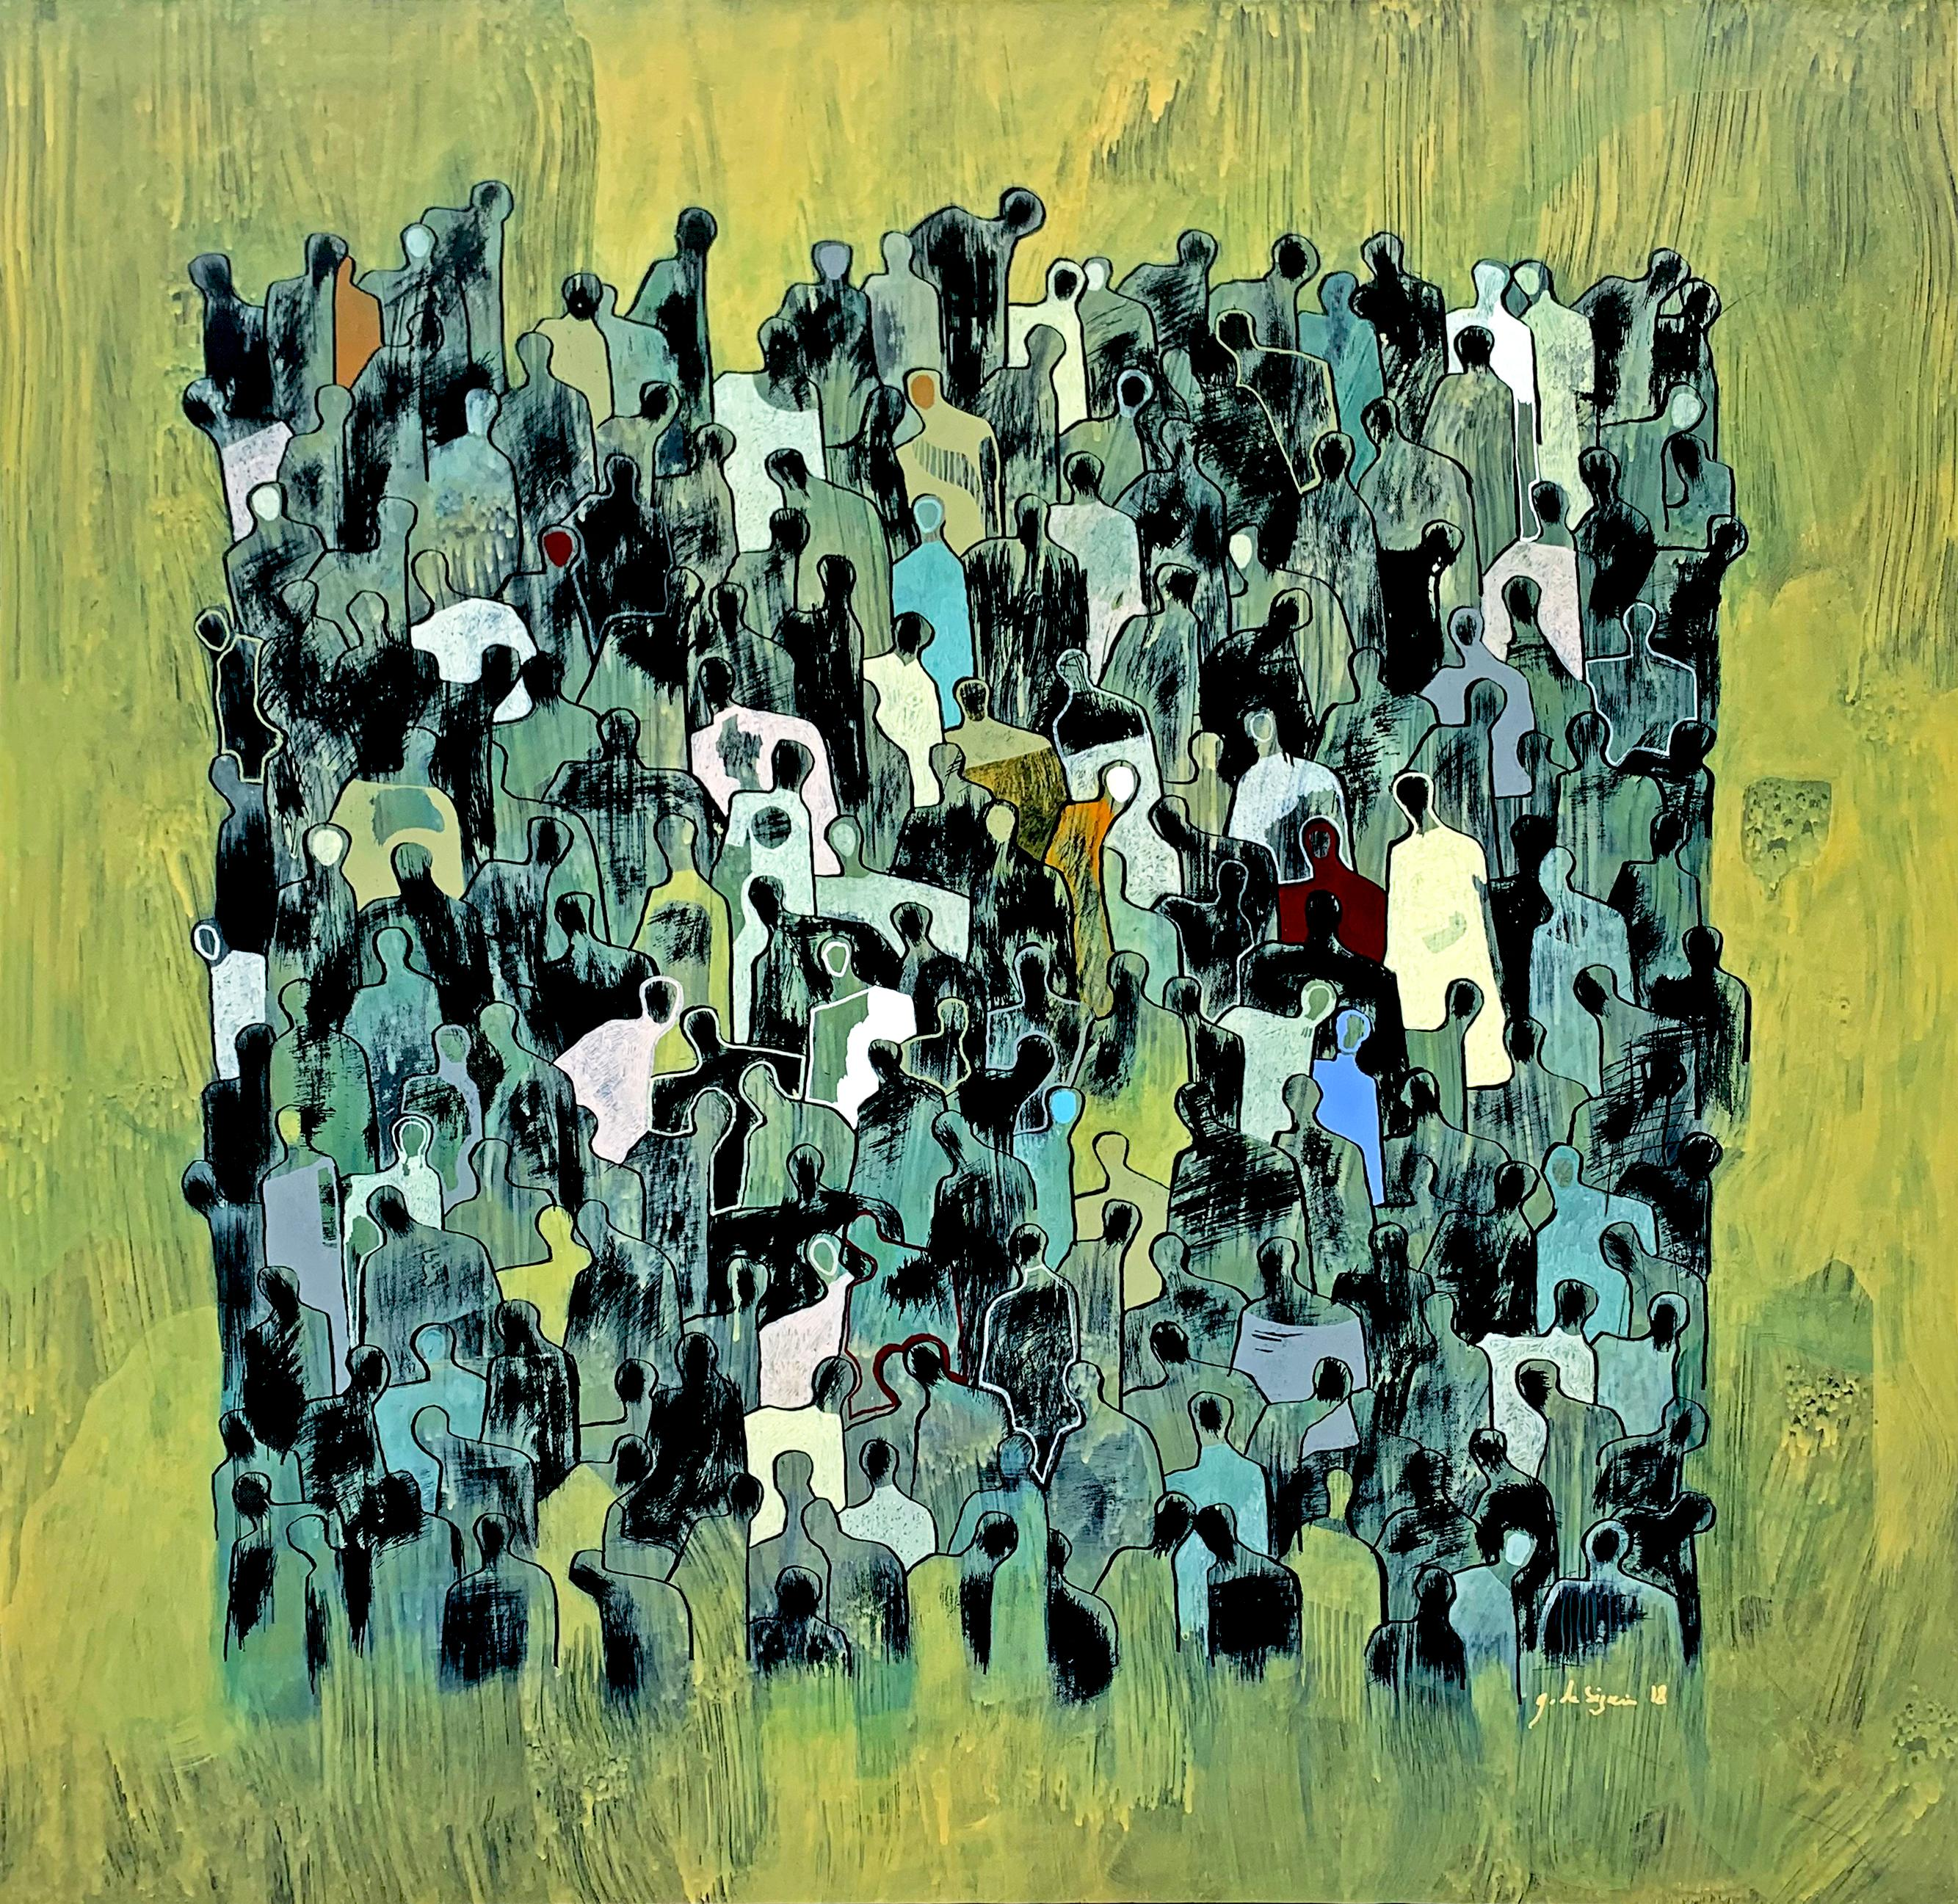 Golden Bond by Gaetan de Seguin -Contemporary Abstract Figurative painting